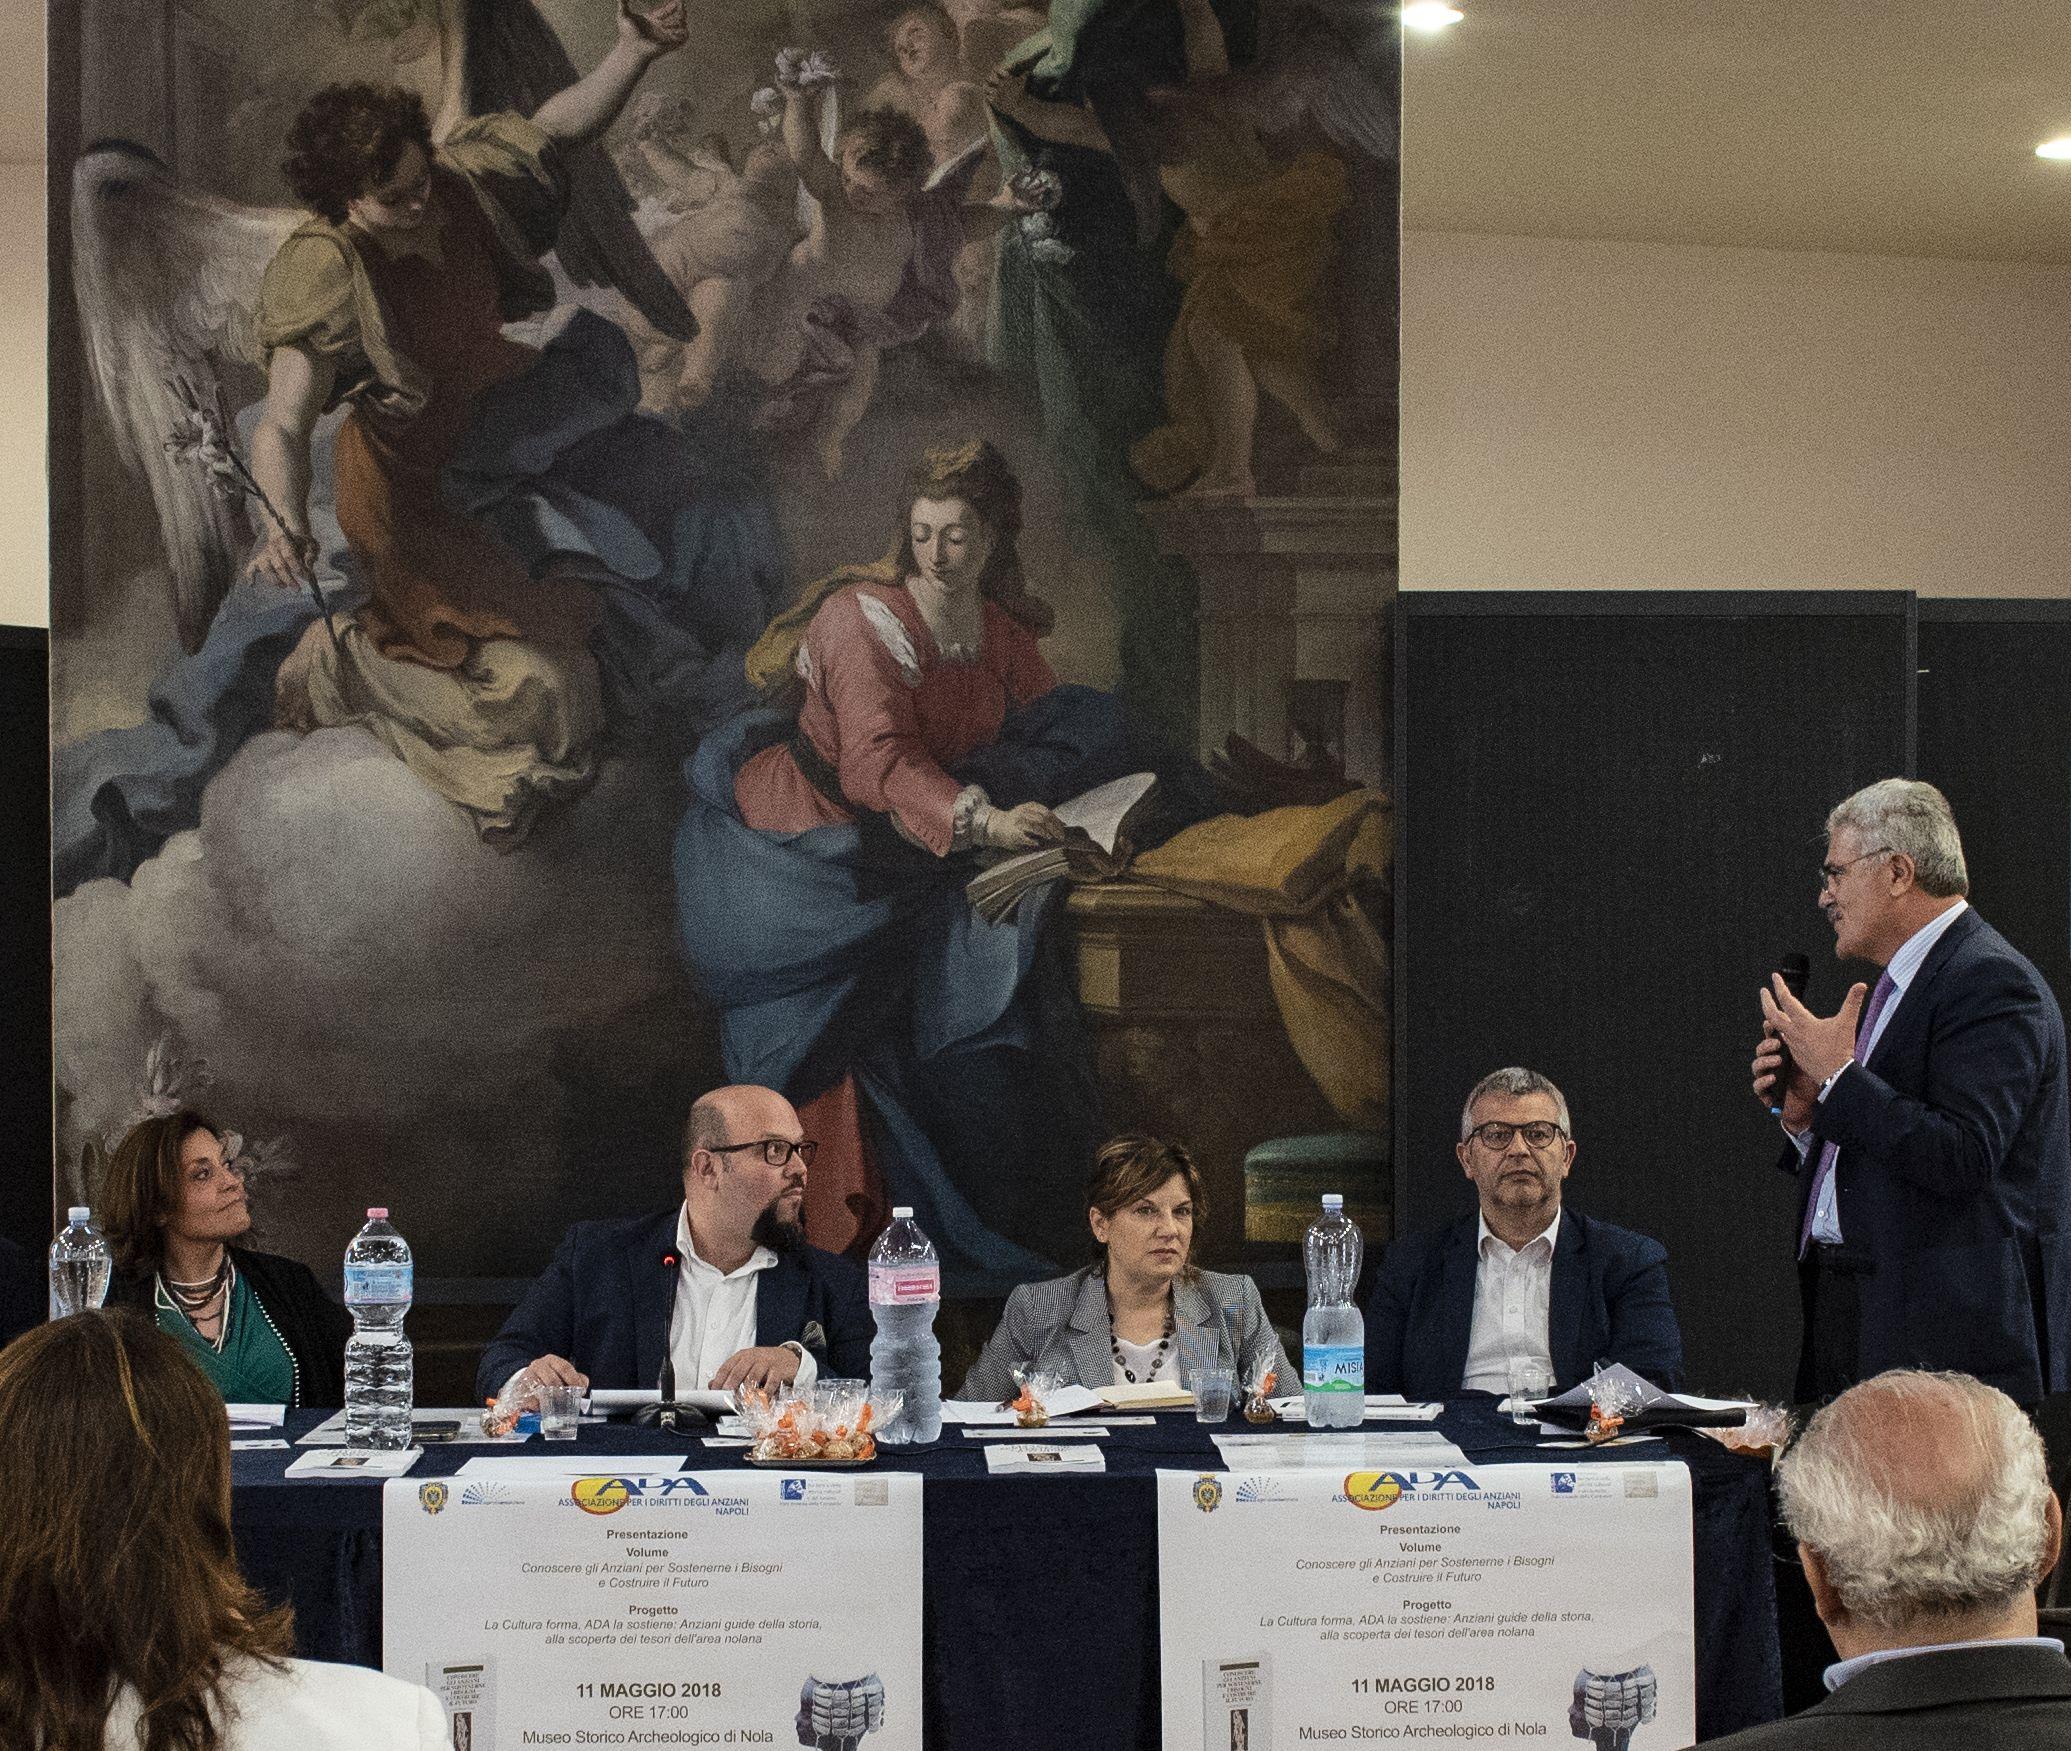 Da sx verso dx: Mara D'Onofrio, Michele Giustiniano, Paola De Vivo, Vincenzo Caprio, Biagio Ciccone